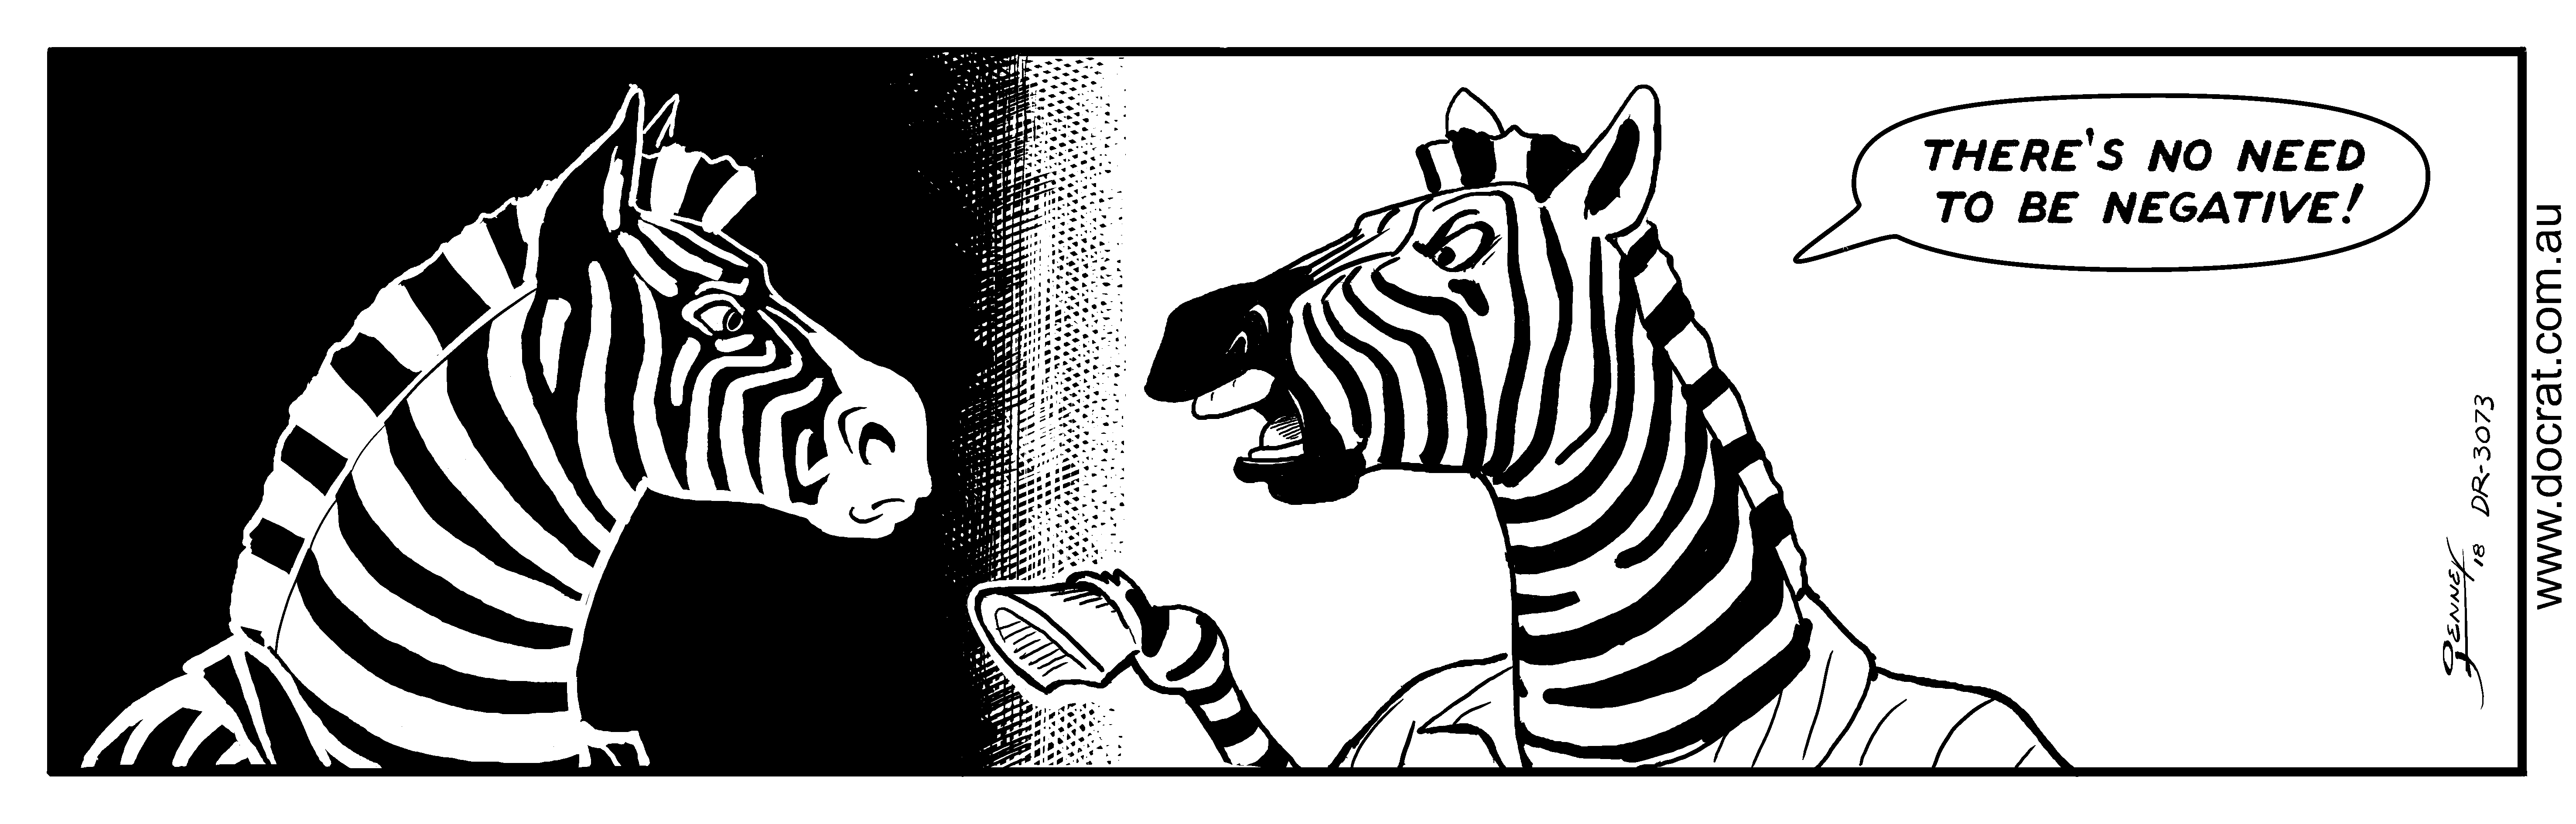 20180919